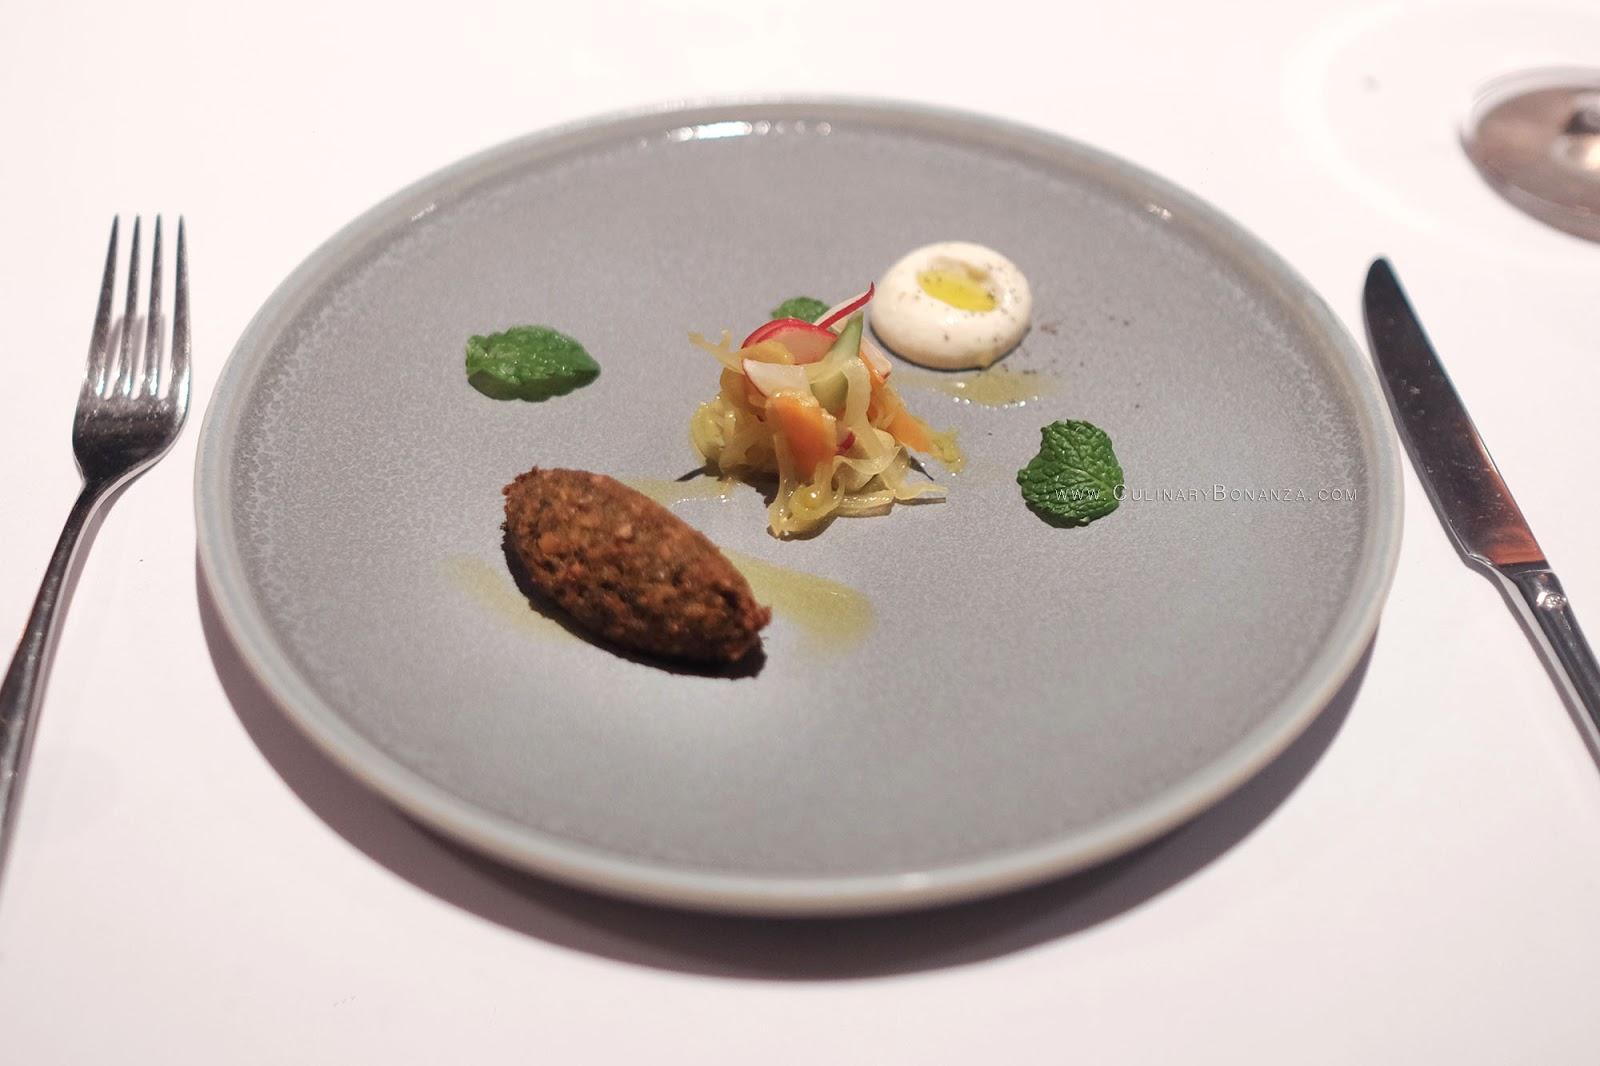 Mejekawi by Ku De Ta Bali (www.culinarybonanza.com)